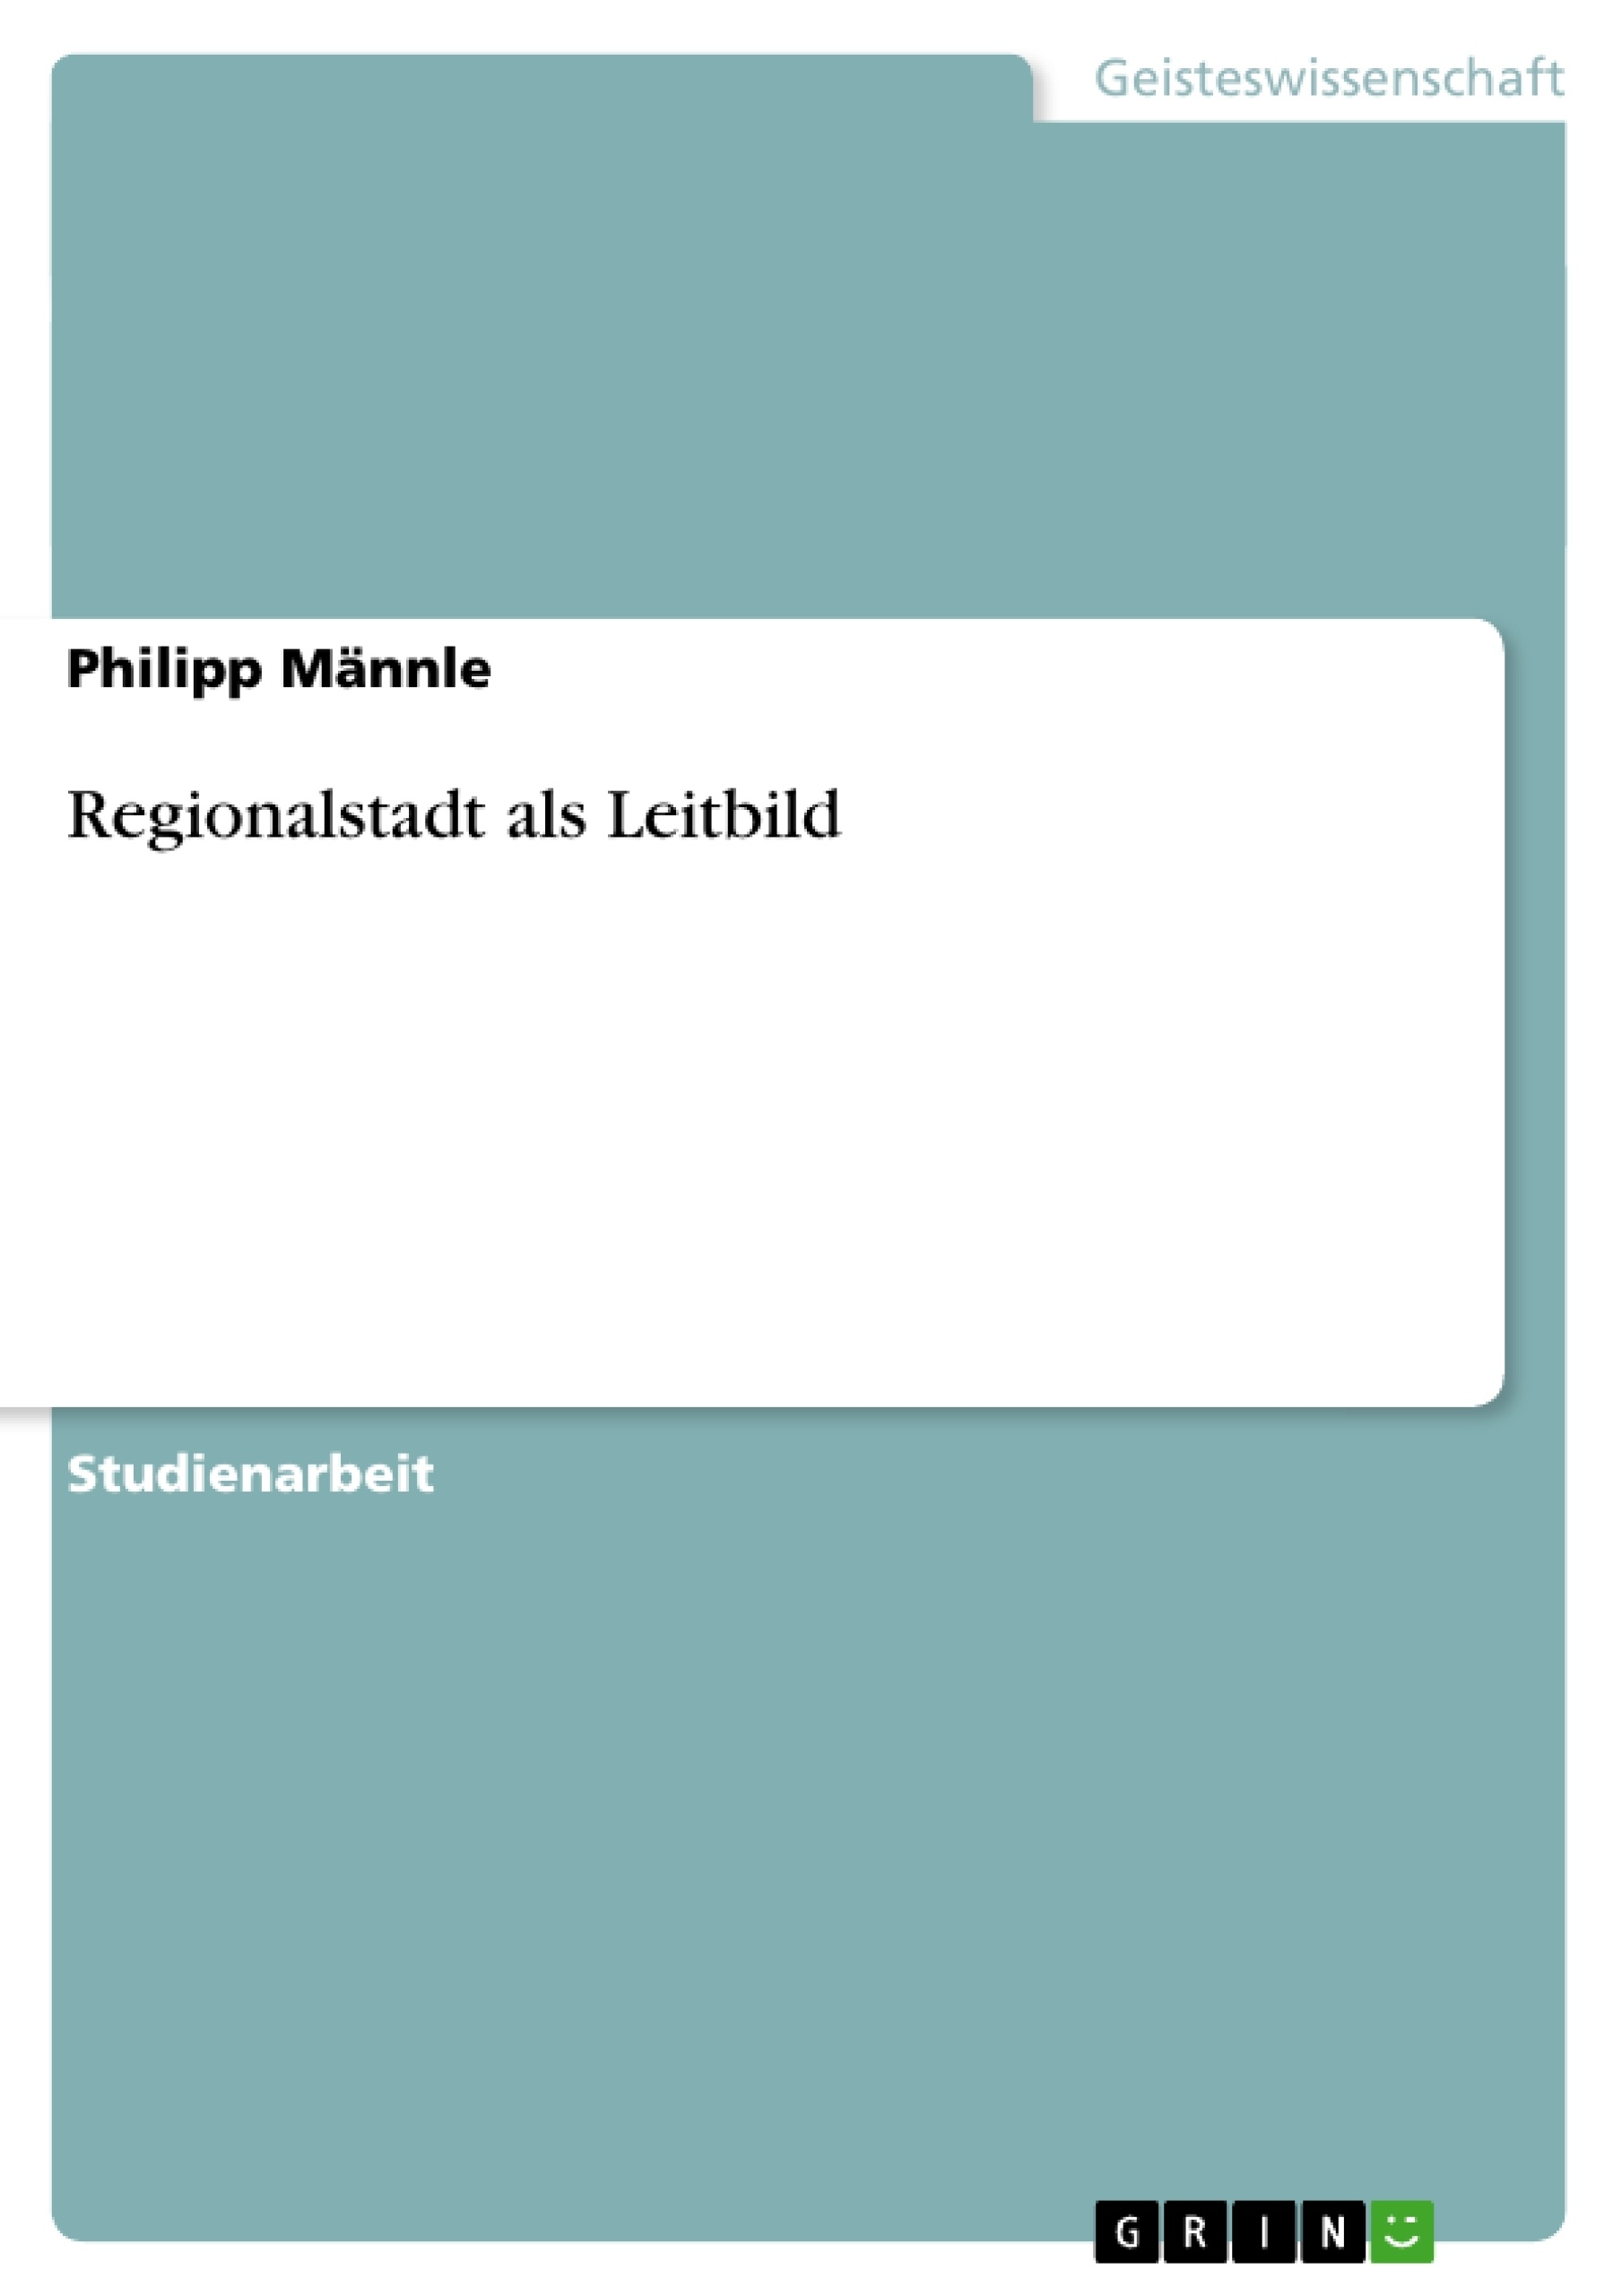 Titel: Regionalstadt als Leitbild